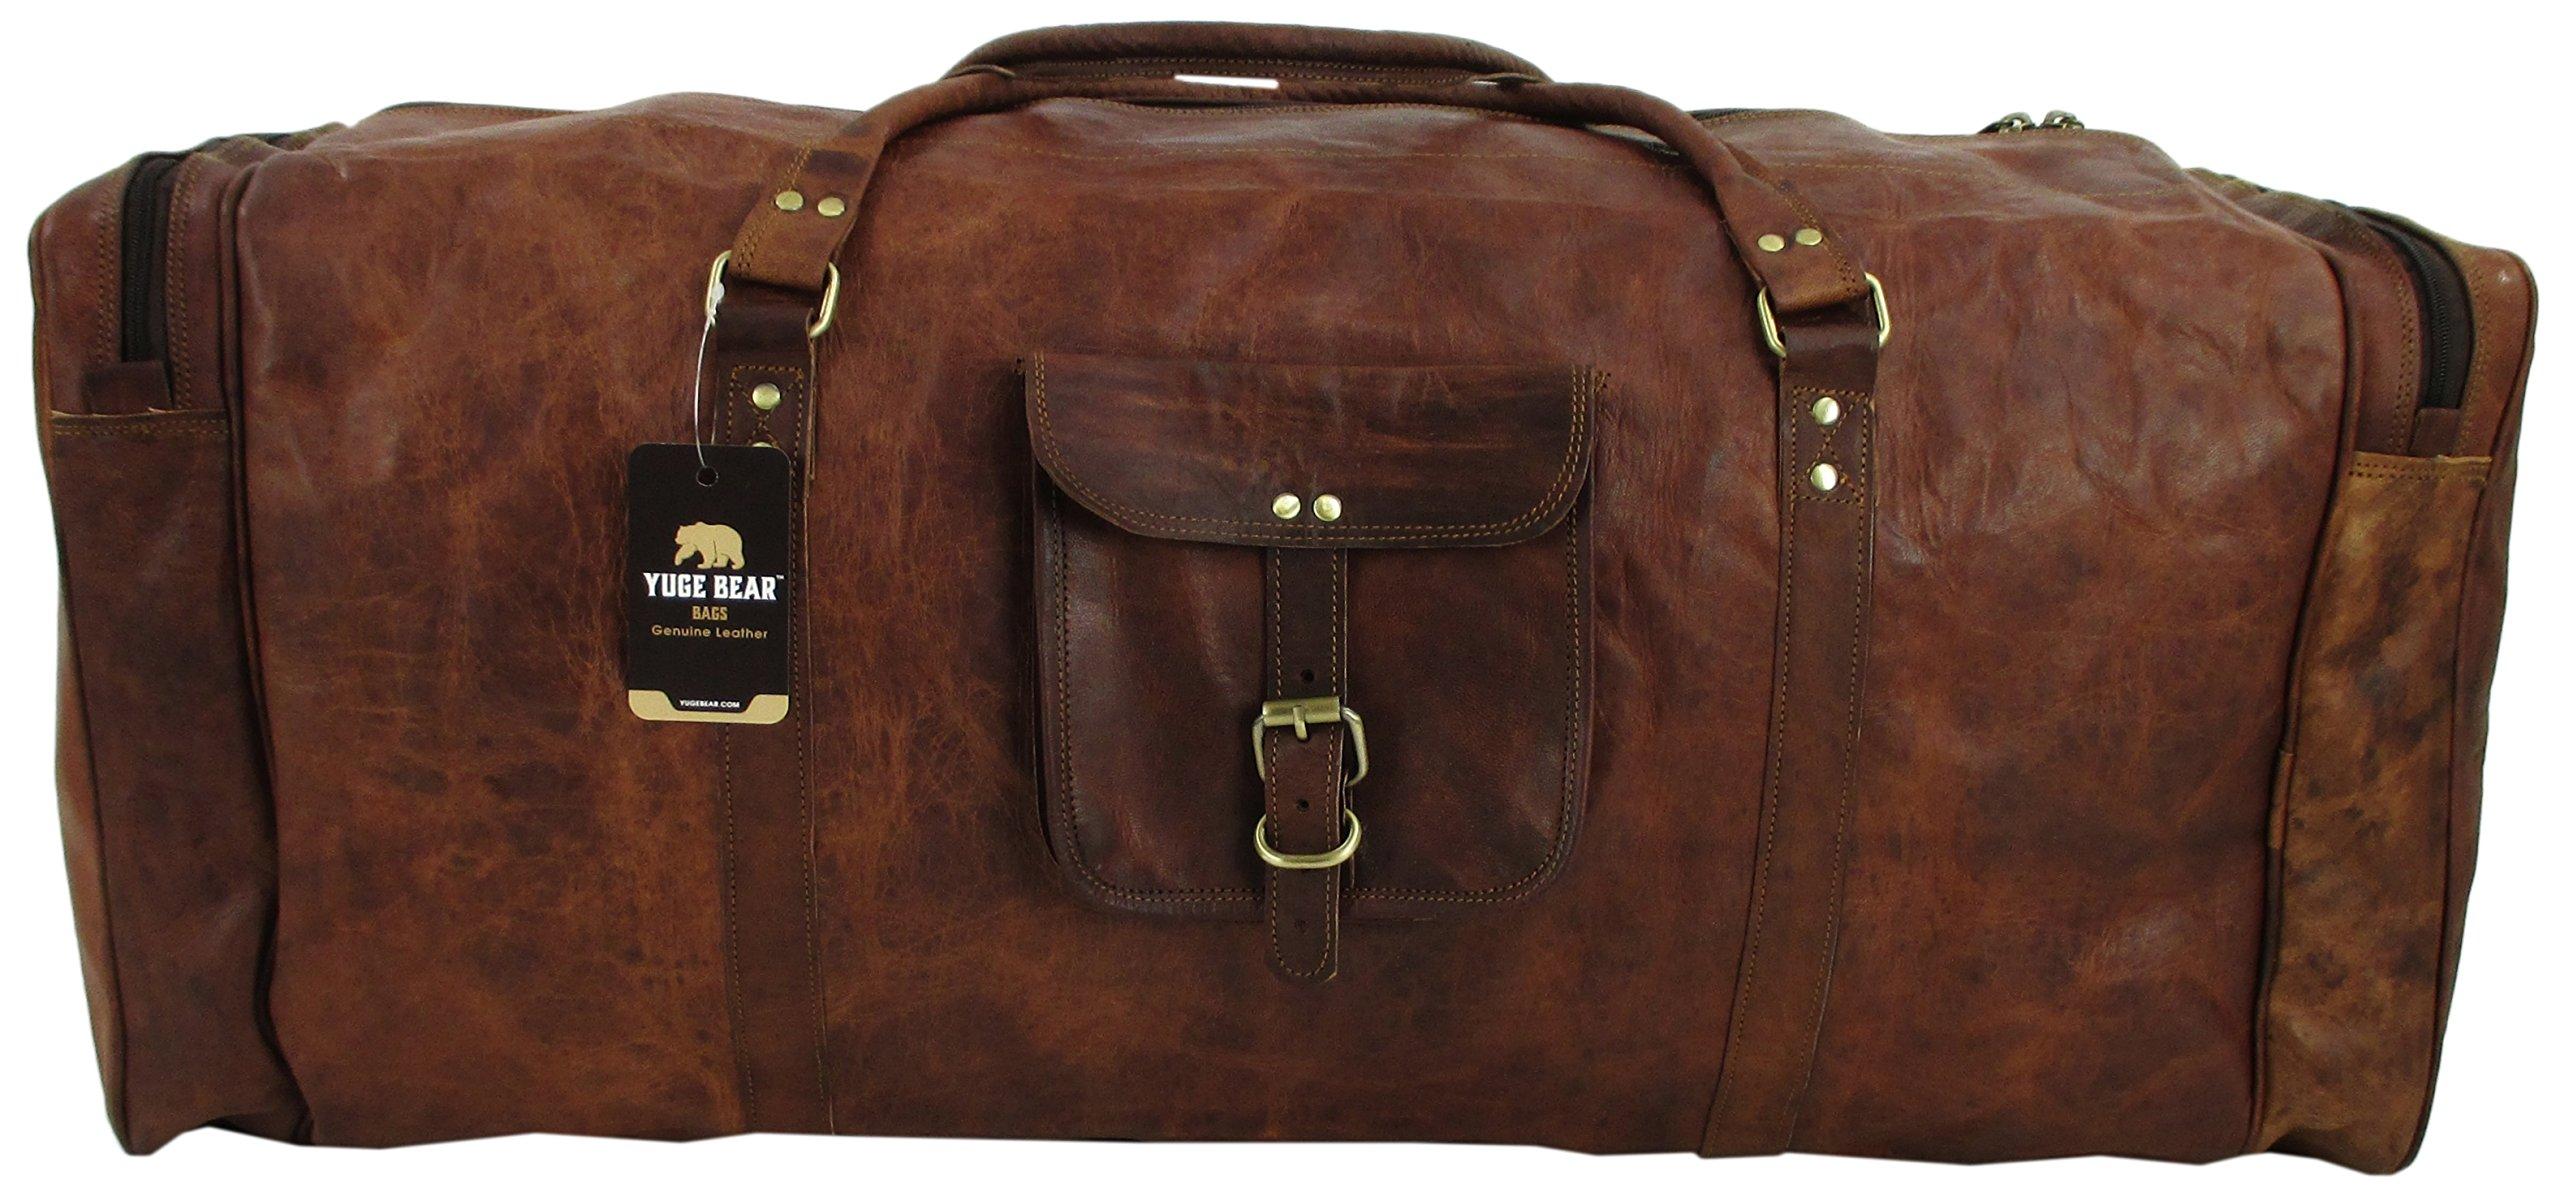 Yuge Bear 32'' DS3 XXL Oversized Vintage Genuine Leather Travel Duffel Bag